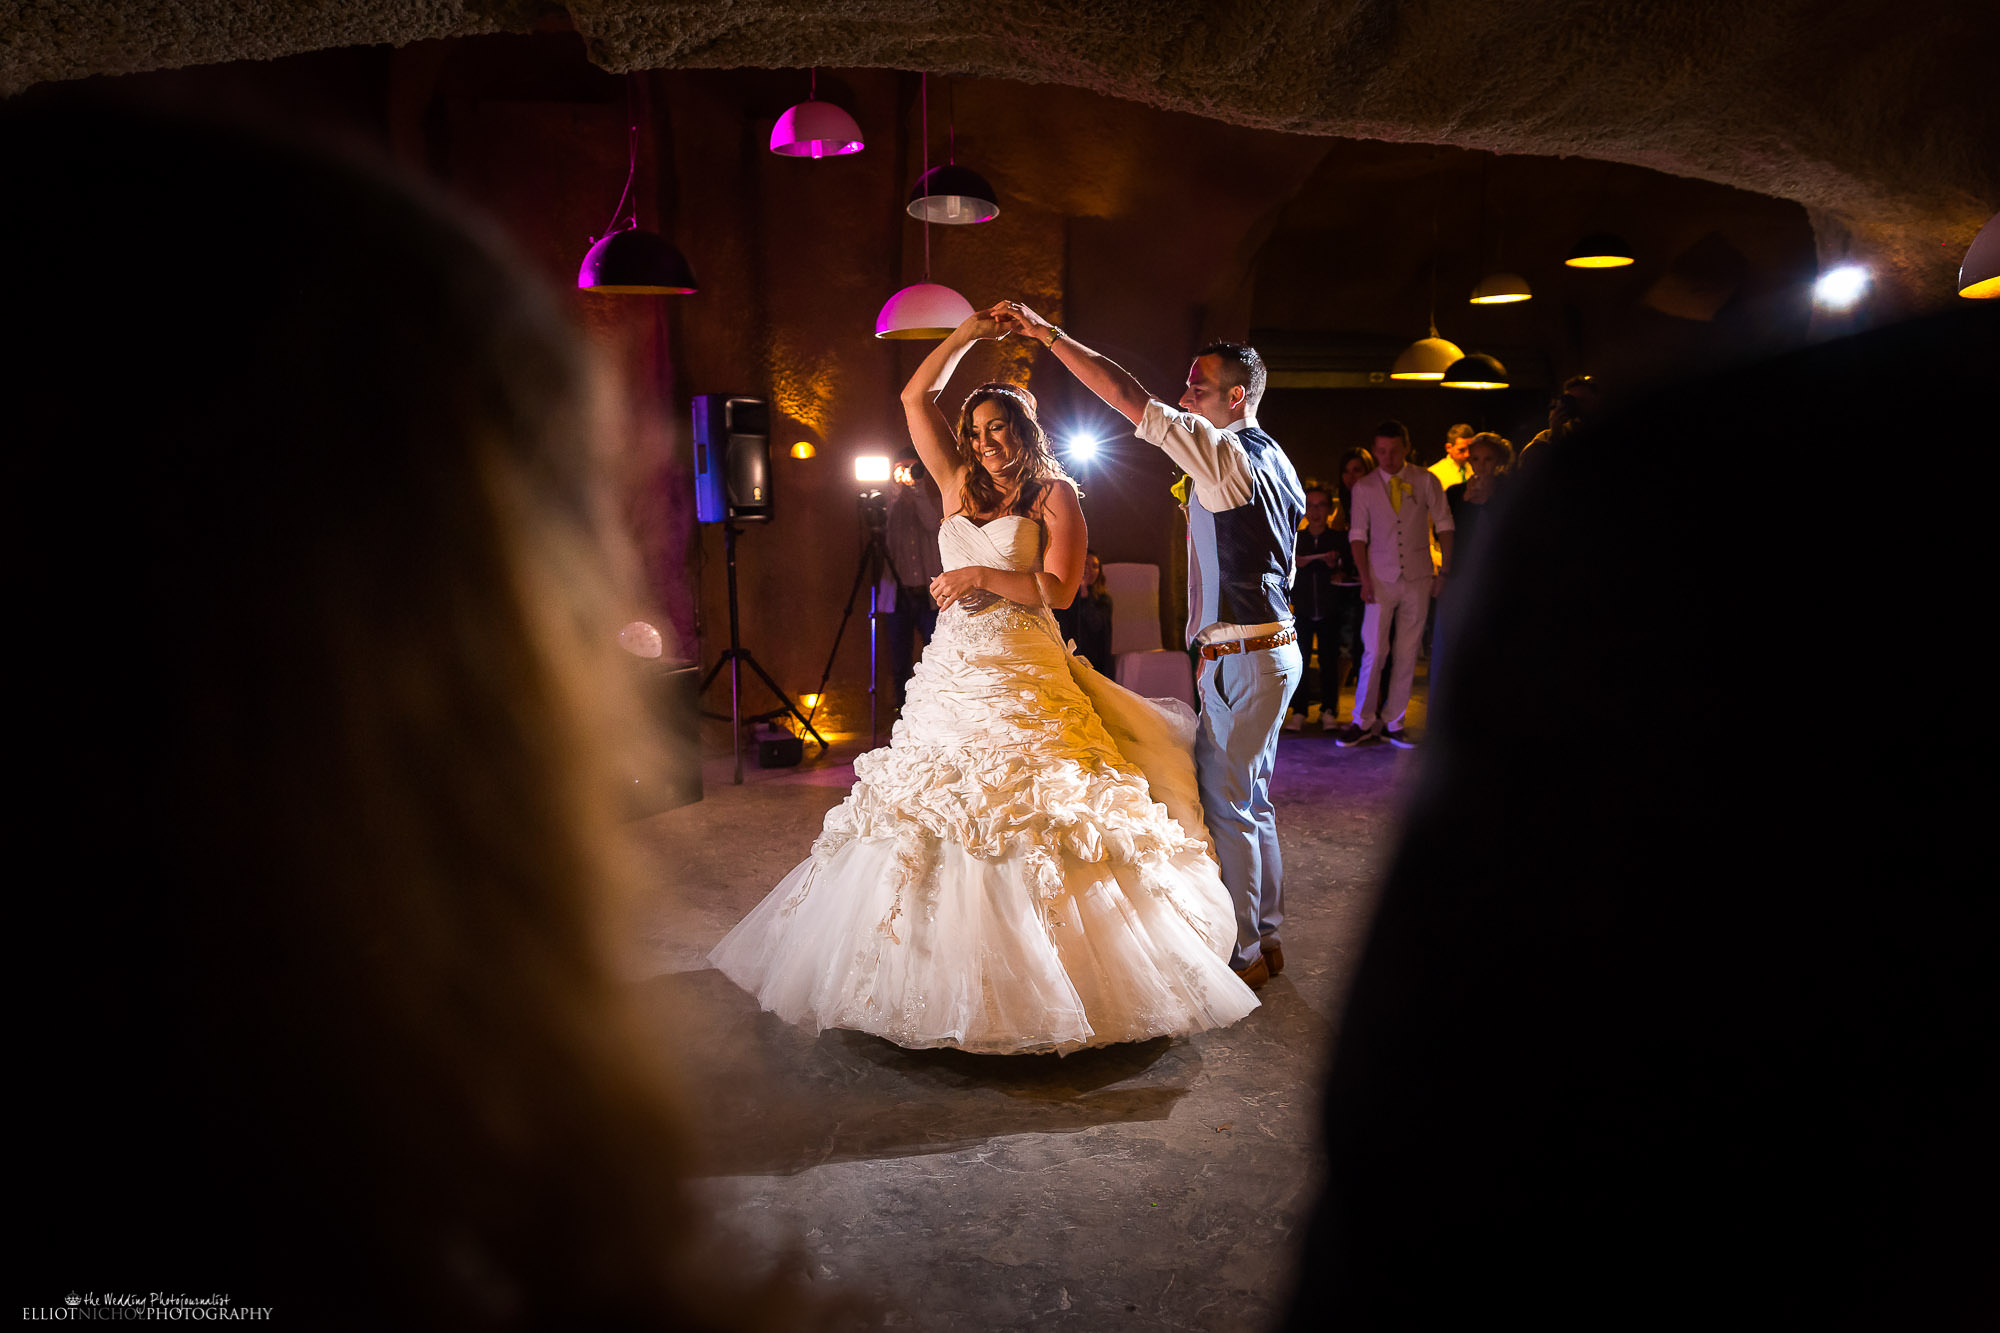 wedding-photography-first-dance-newlyweds